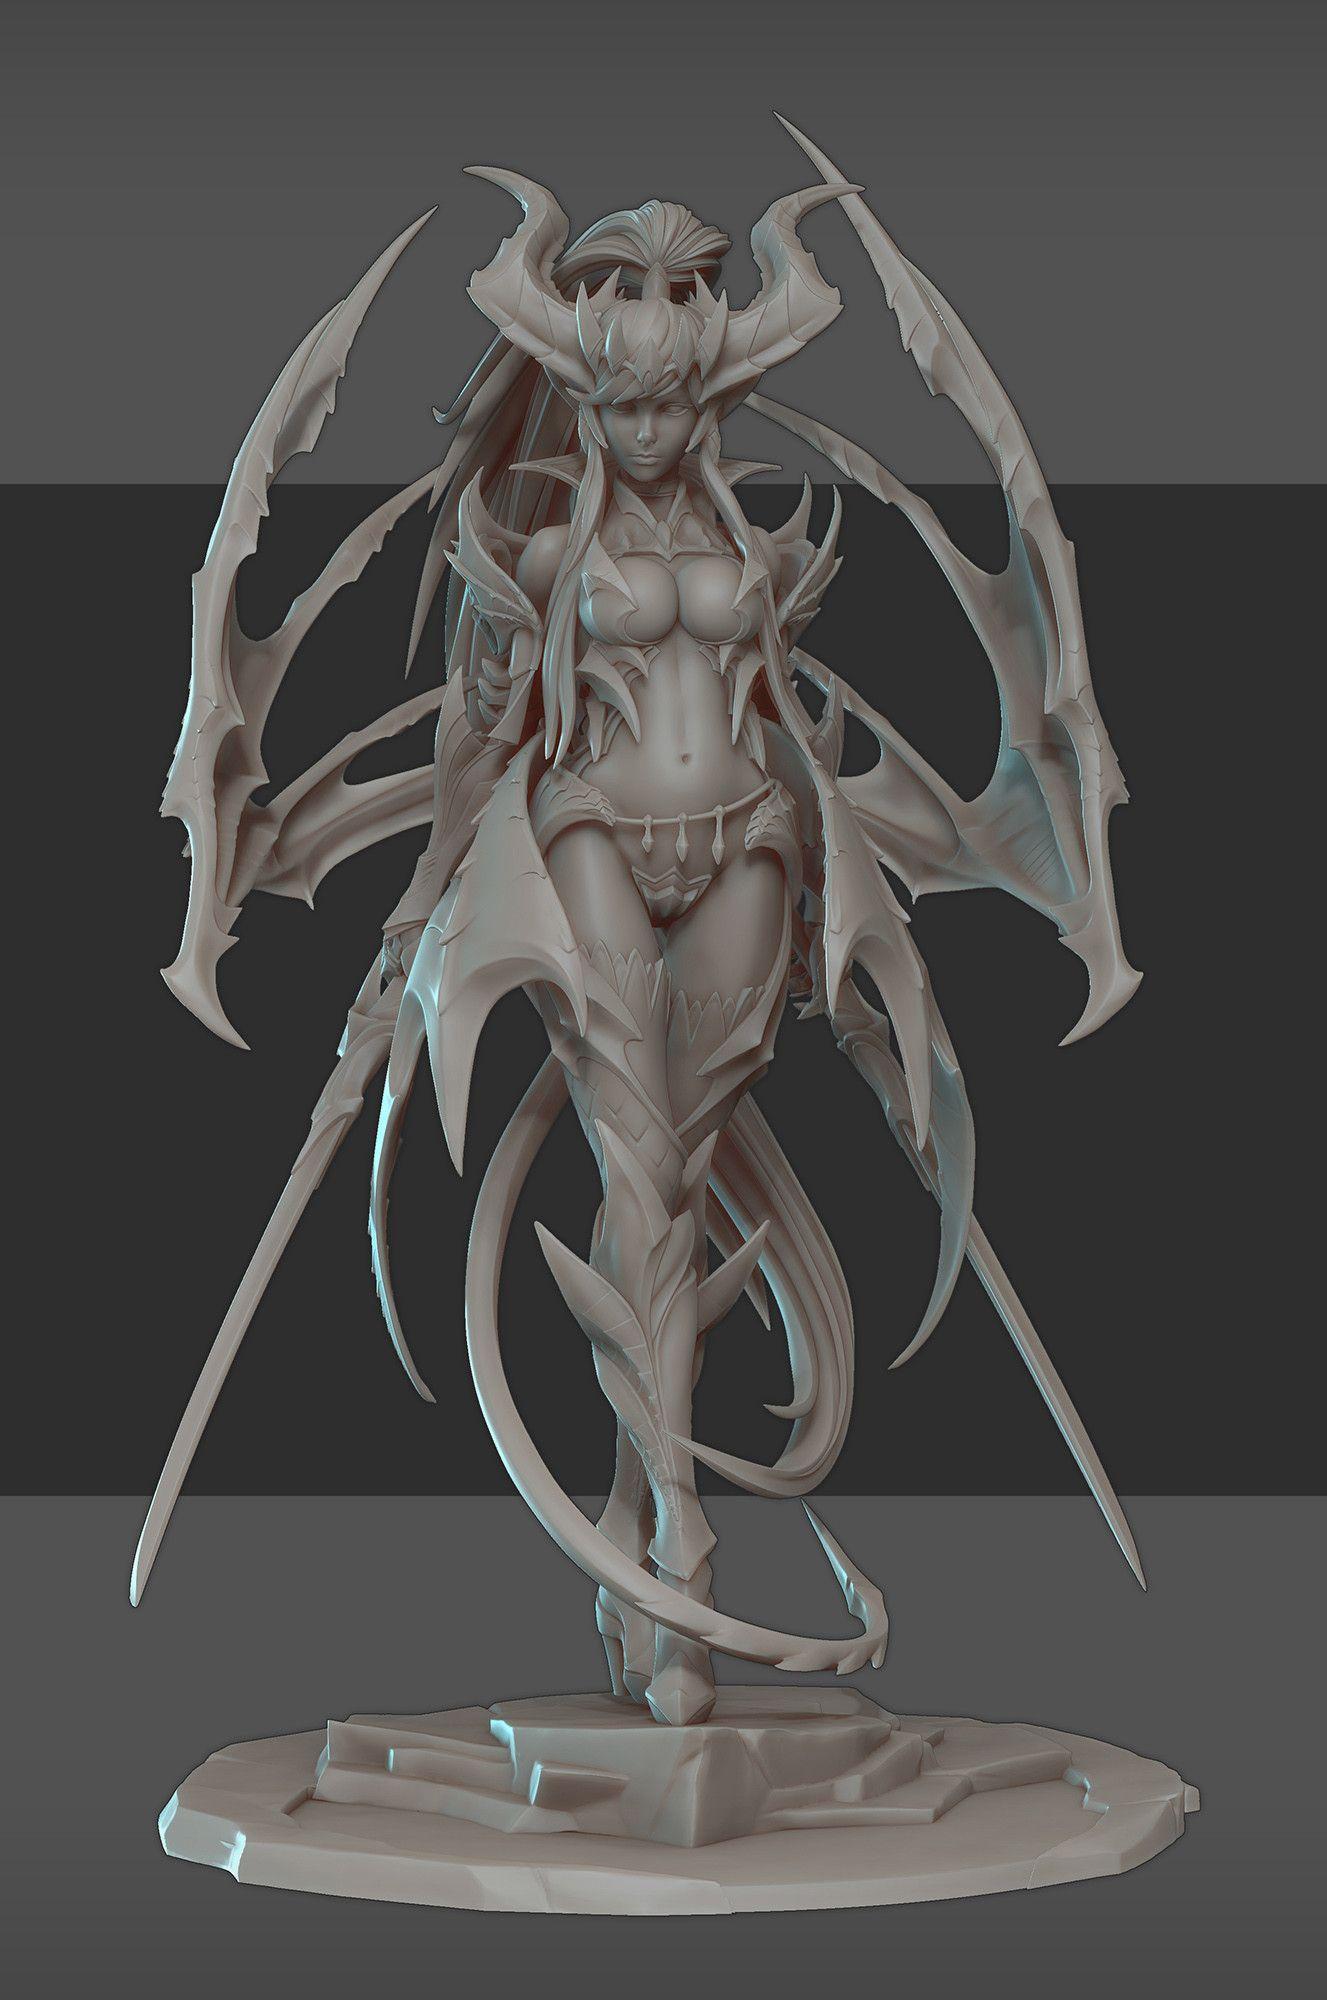 ArtStation - Lucilla, Vampiric drake figure, Vadim Bakhlychev